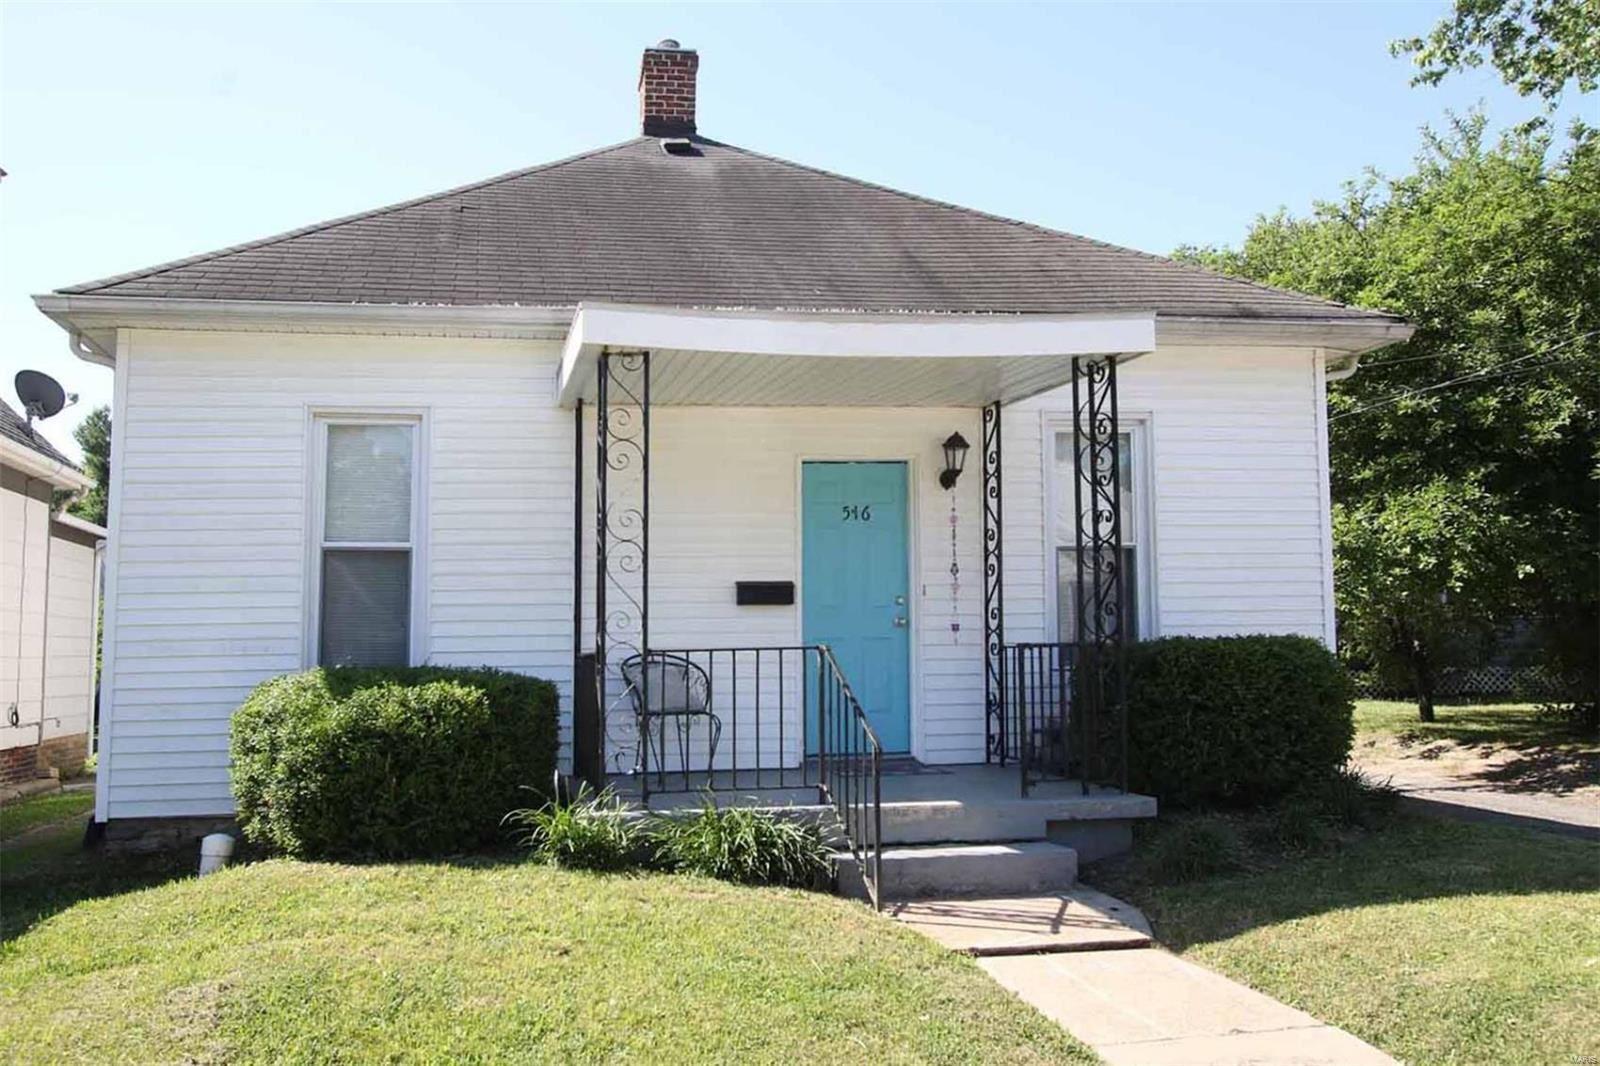 516 Burroughs Avenue, Collinsville, IL 62234 - MLS#: 20041827